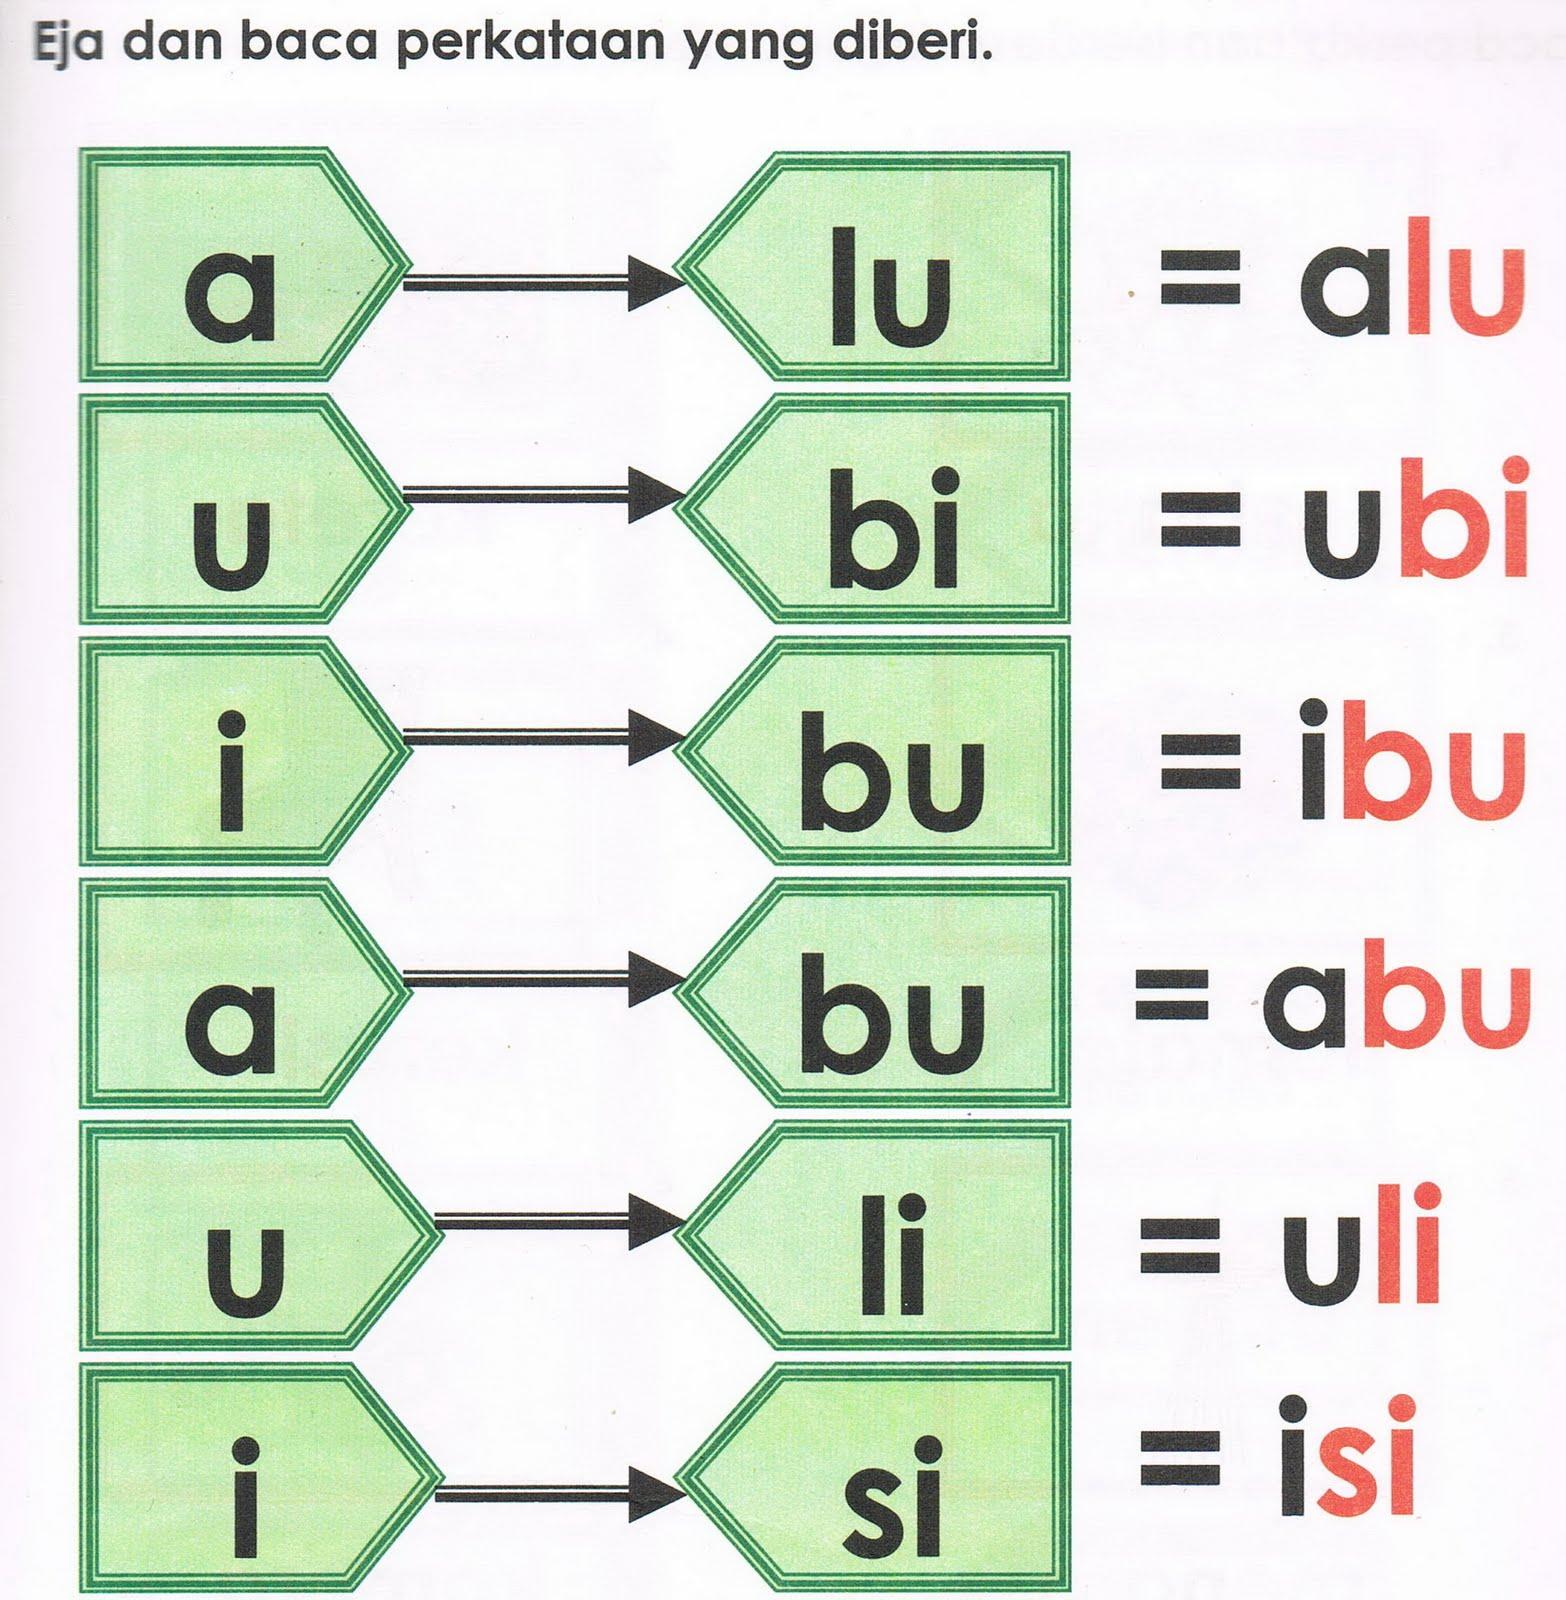 Pengajaran Bahasa Malaysia: sambungan (suku kata KKVK)